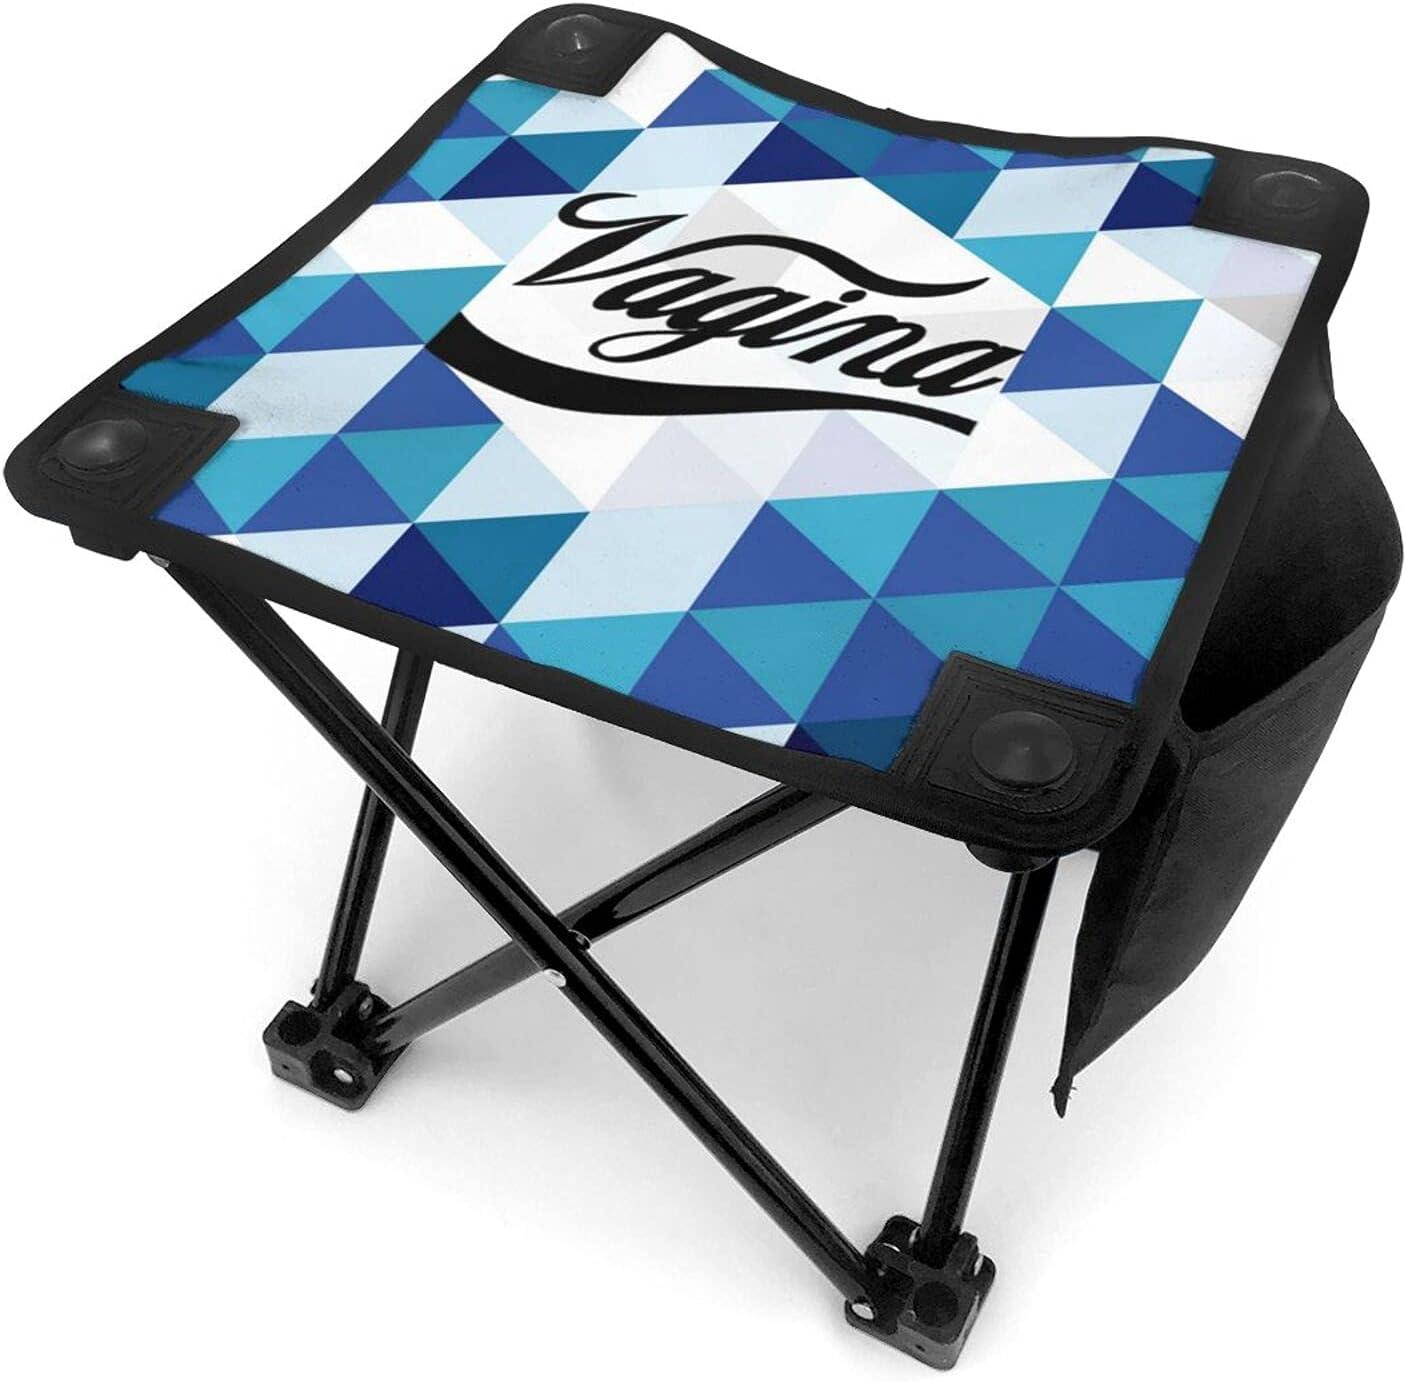 I Enjoy Vagina Camping Stool Popular brand Stools Sale SALE% OFF Portable Fol Mini Ultralight